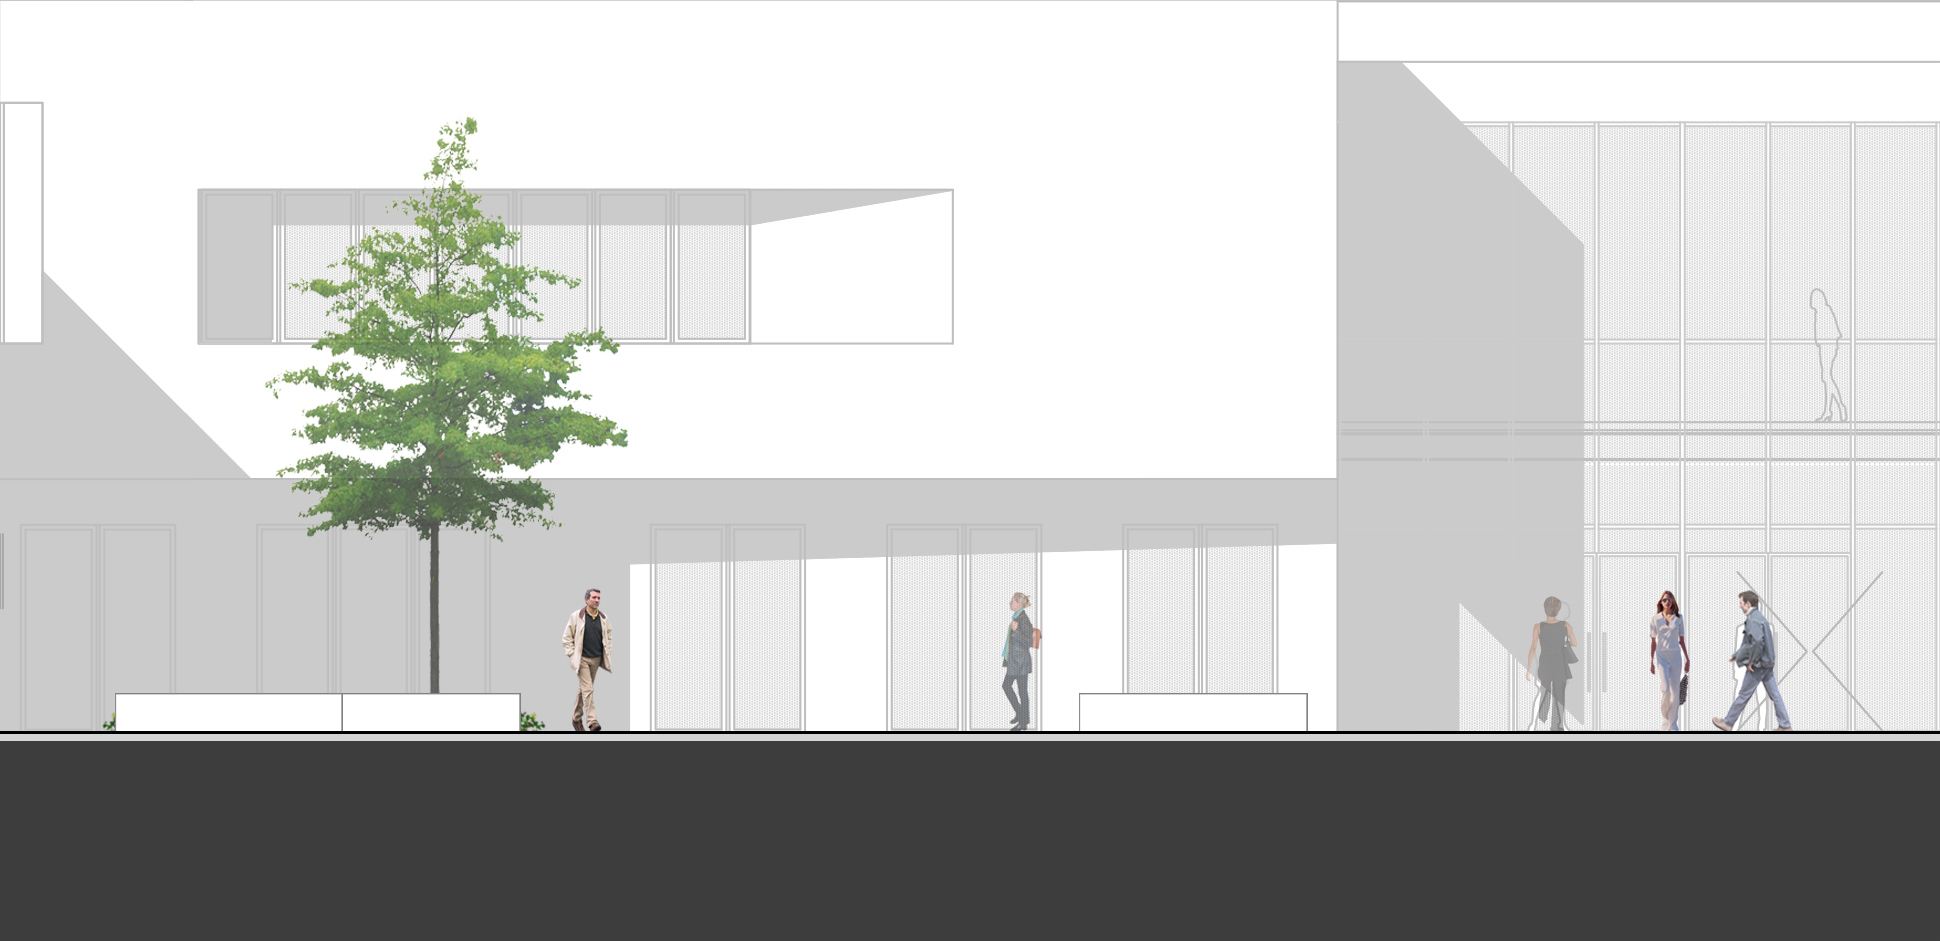 lycée_gabriel_péri_champigny_sur_marne_public_outdoor_design_christophe_gautrand_paysagiste_5.jpg